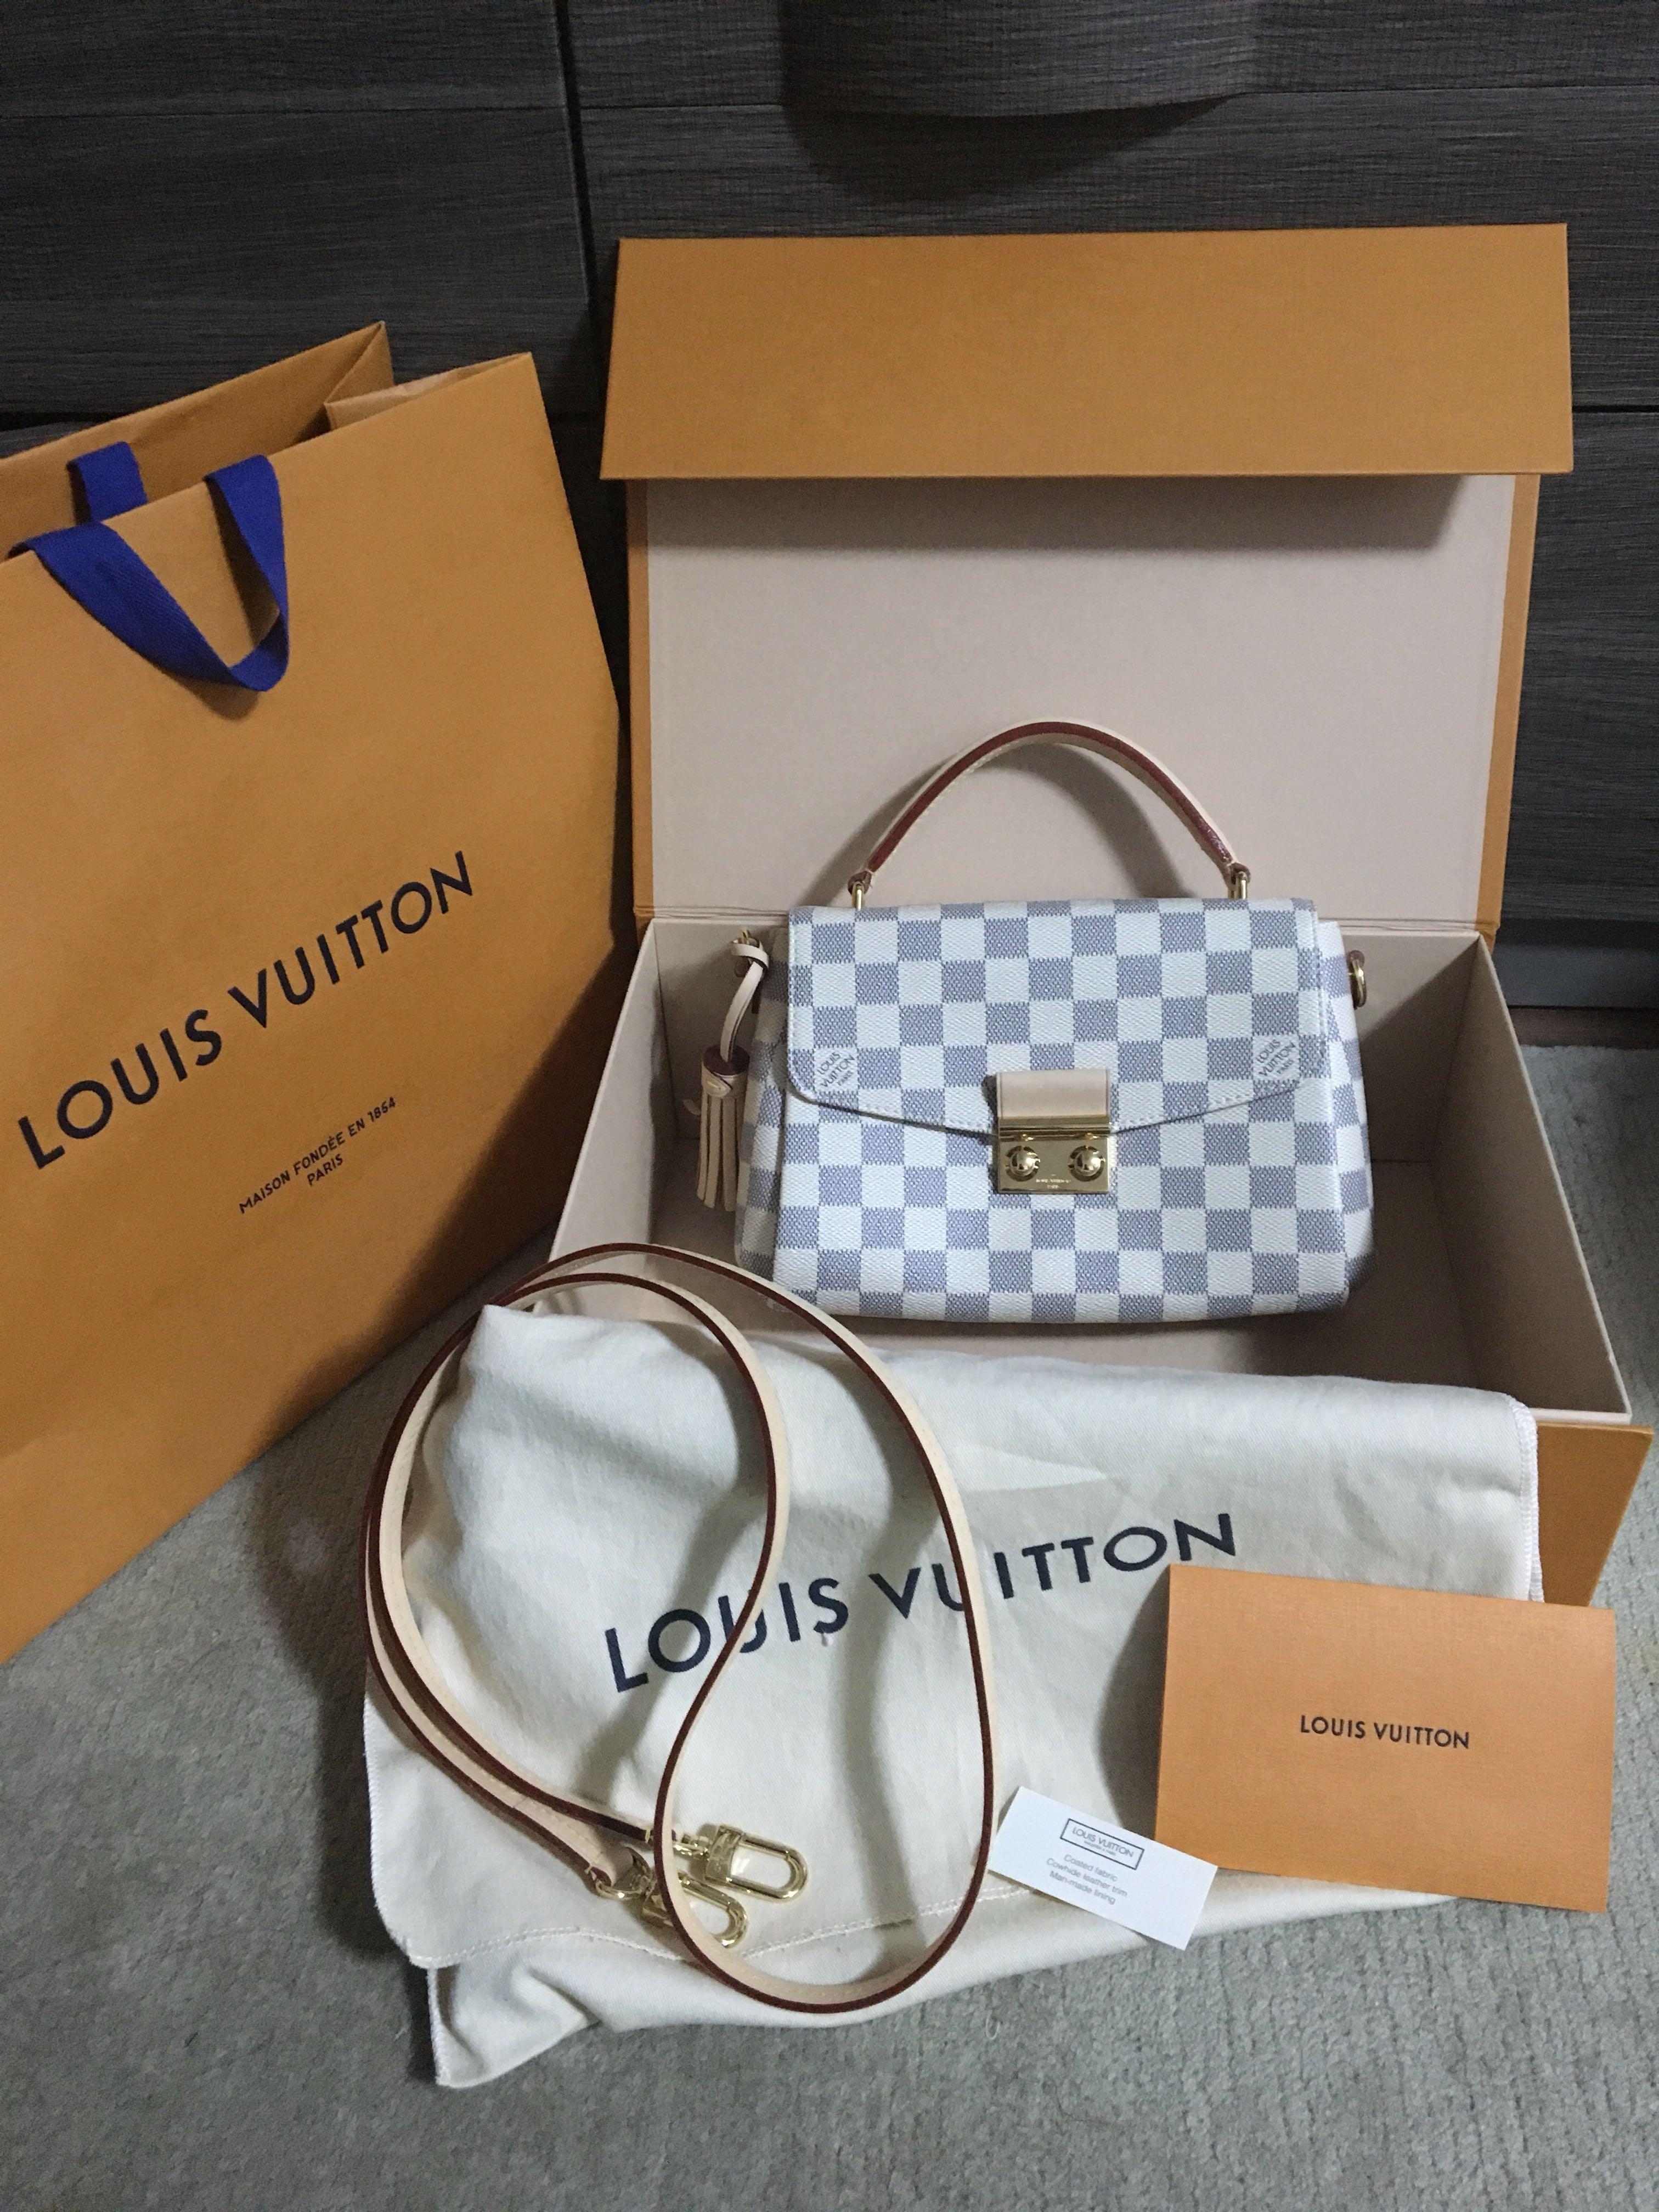 Louis Vuitton CROISETTE Damier Azur - New Rm5900 (Retail in Malaysia Rm7000)